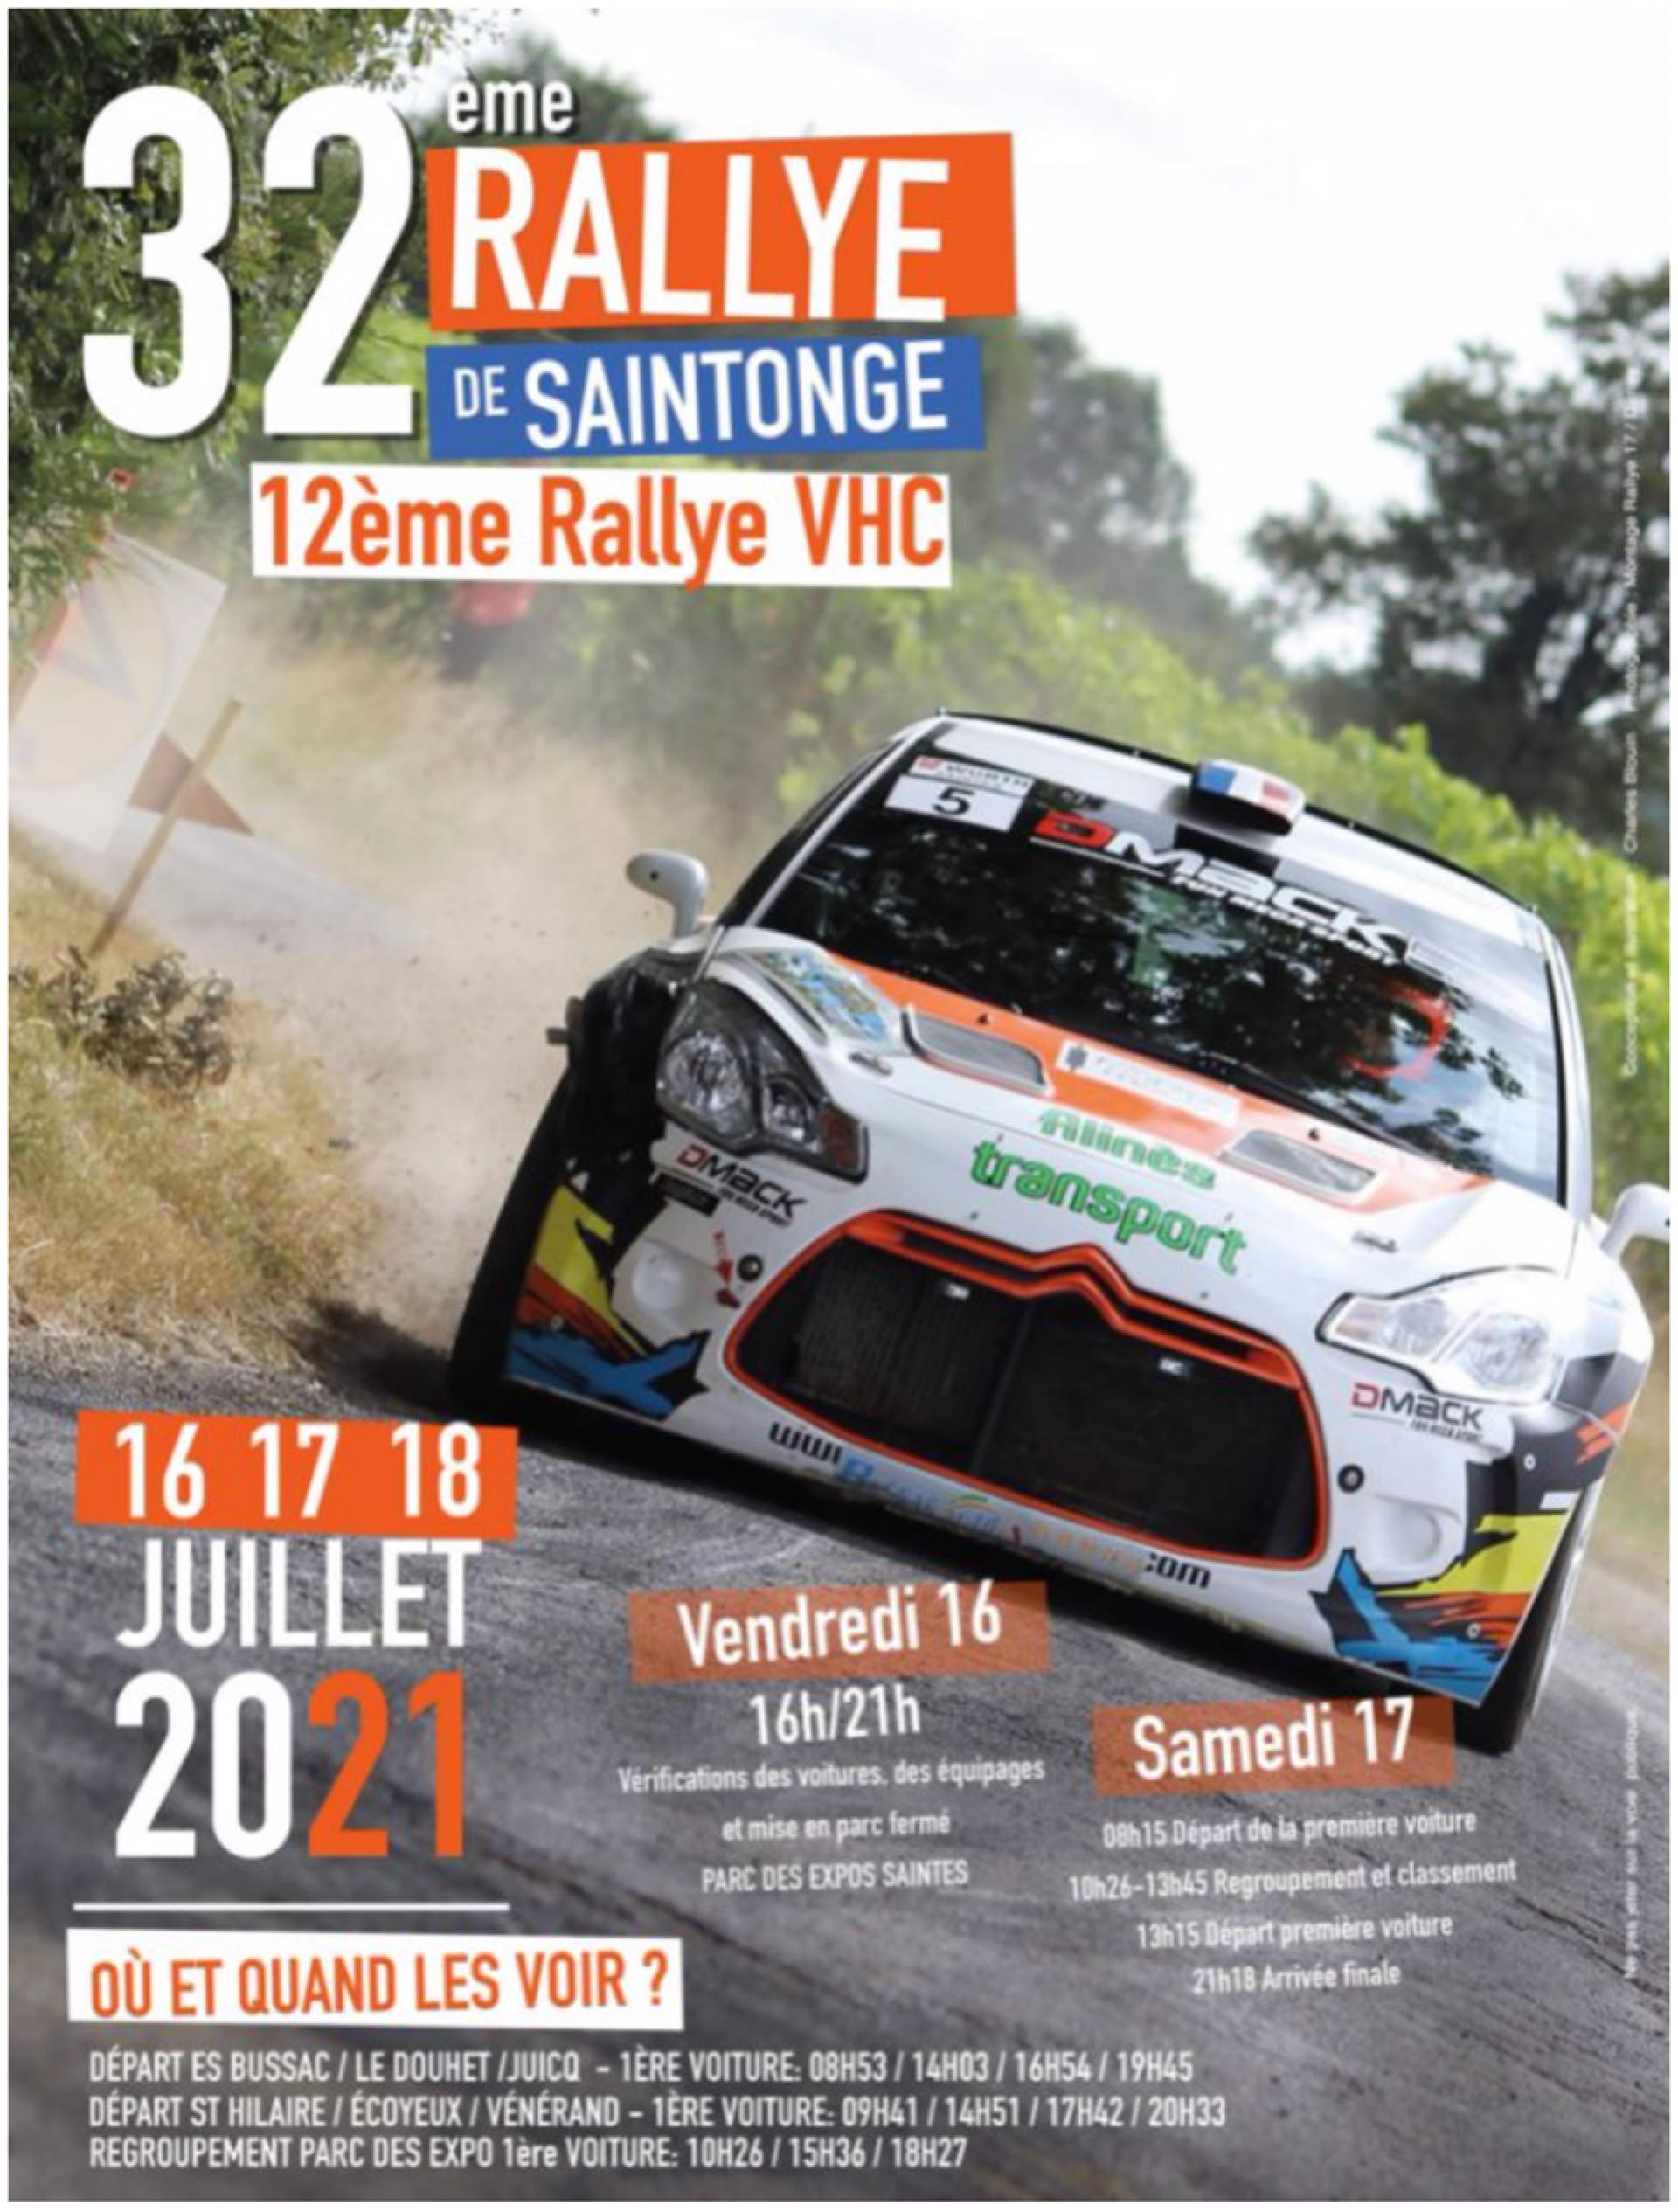 Rallye De Saintonge 2021